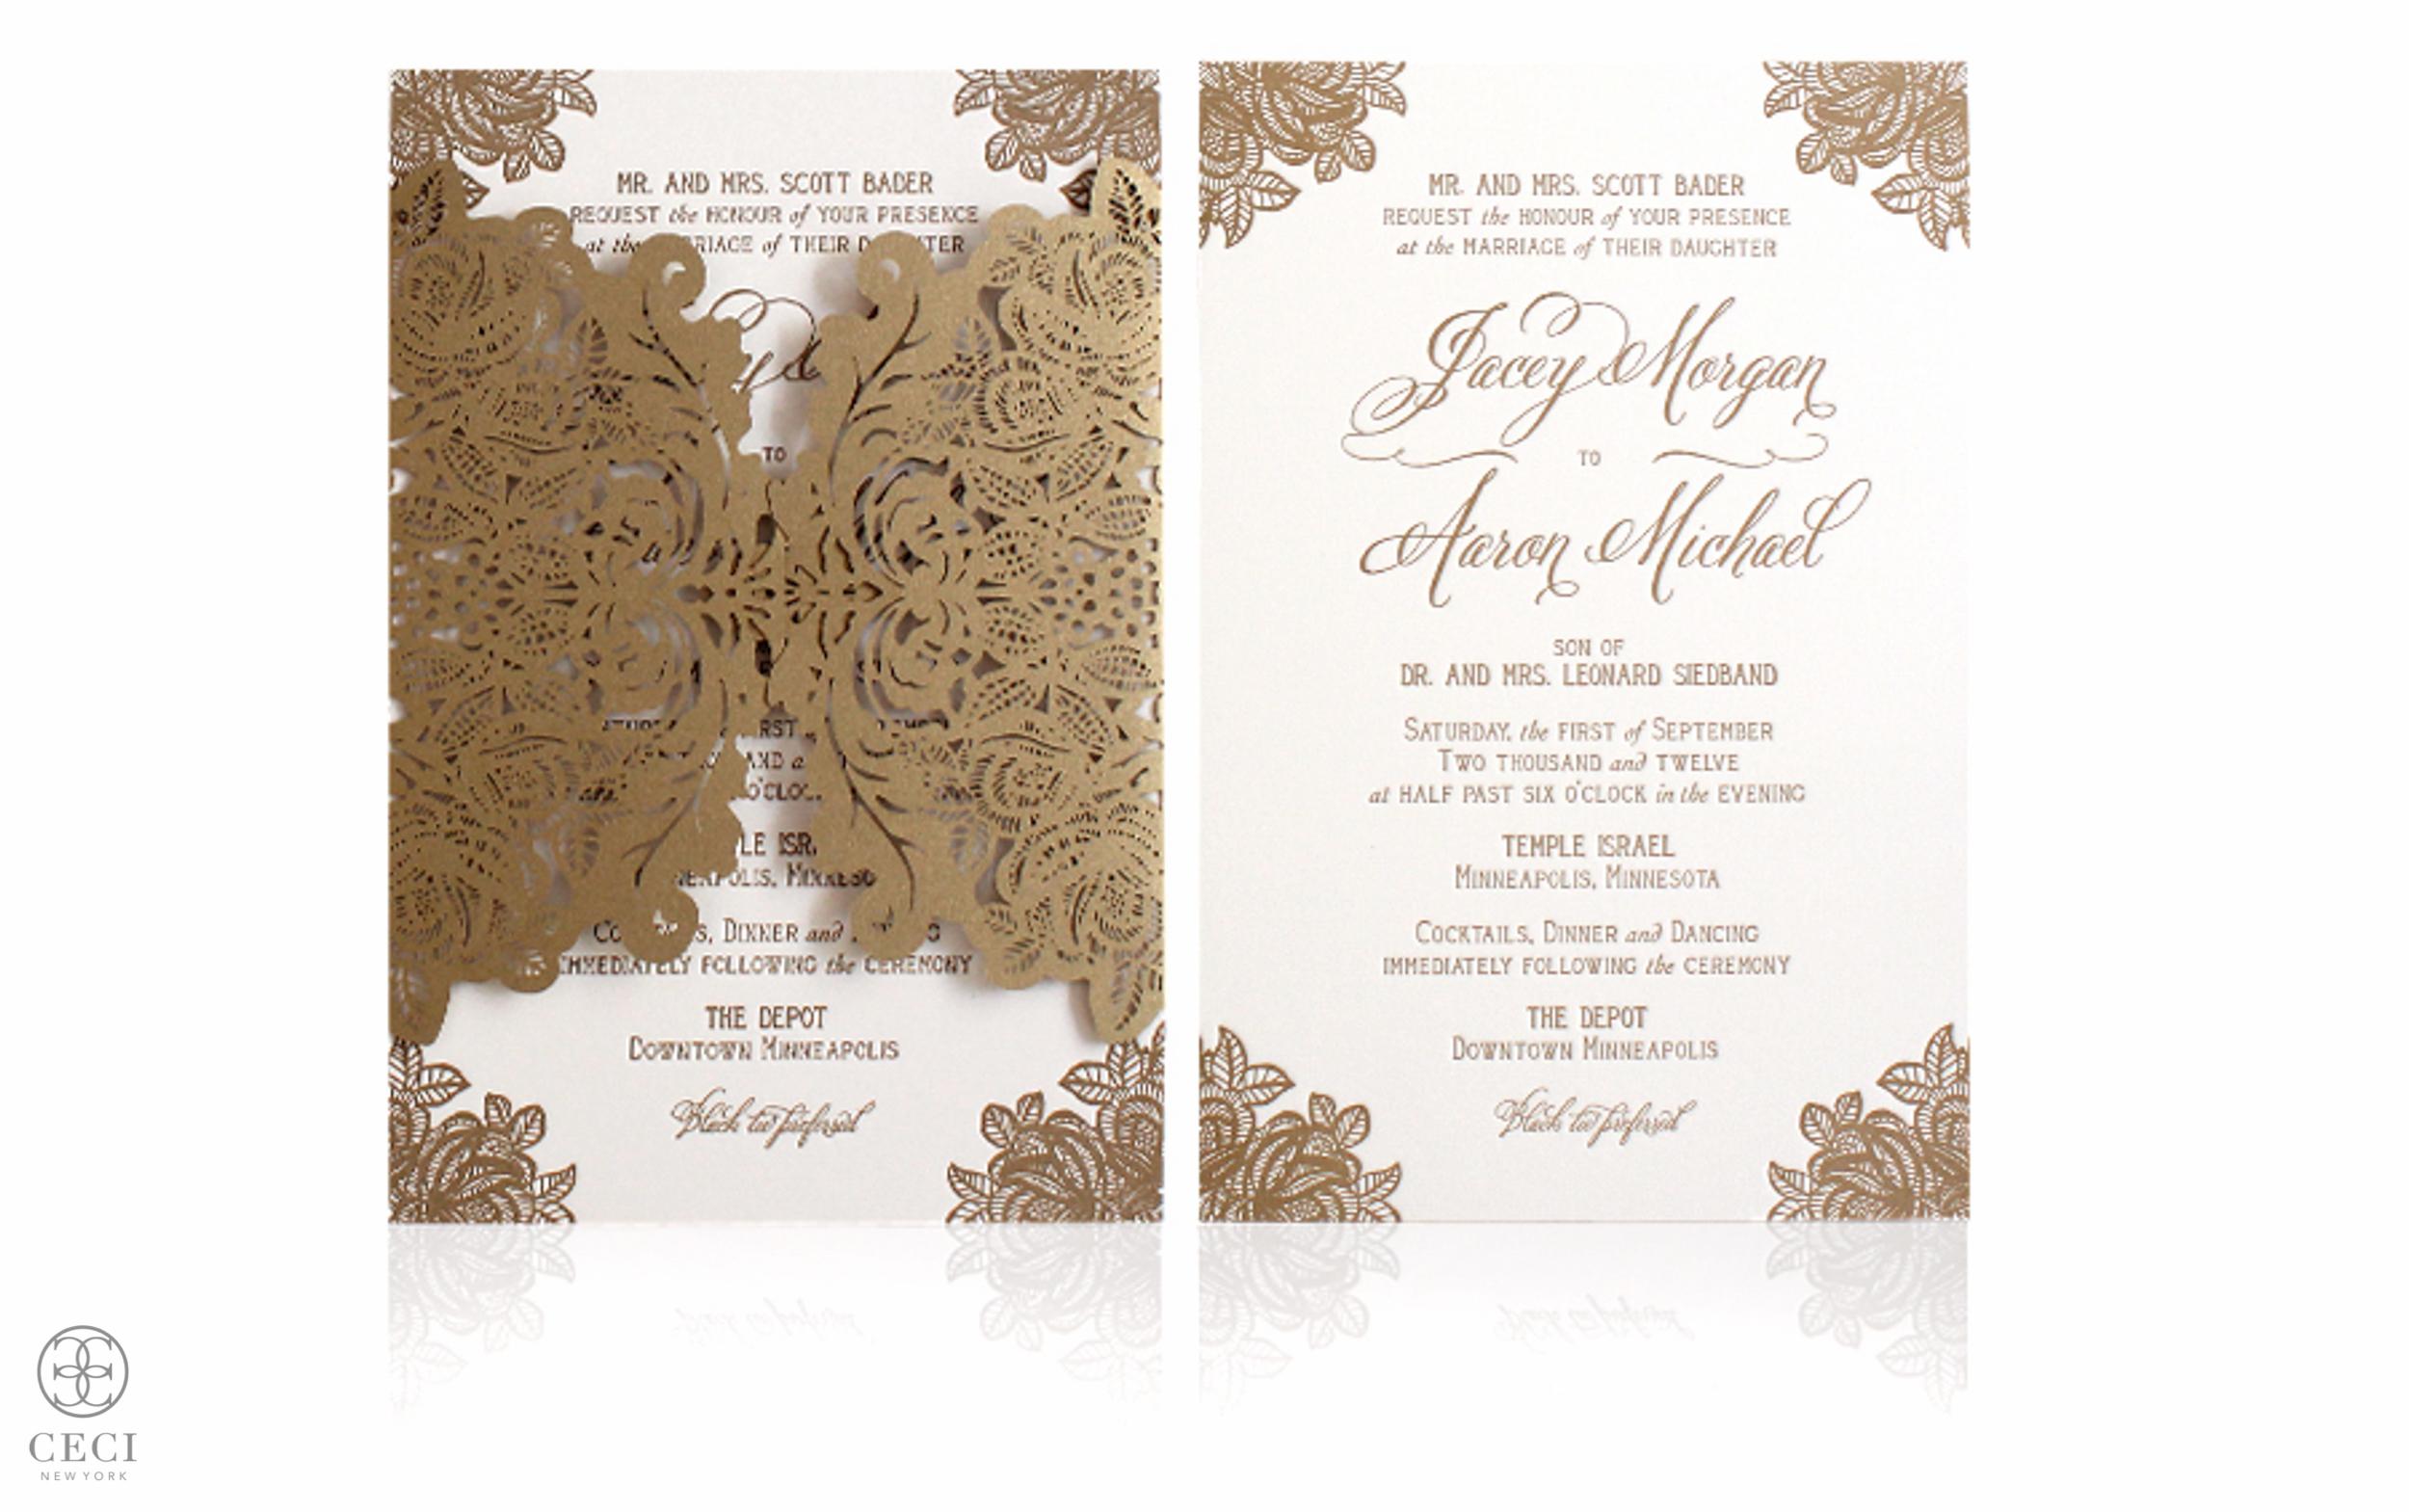 Ceci_New_York_Ceci_Style_Ceci_Johnson_Luxury_Lifestyle_Floral_Lace_Wedding_Letterpress_Inspiration_Design_Custom_Couture_Personalized_Invitations_-10.jpg